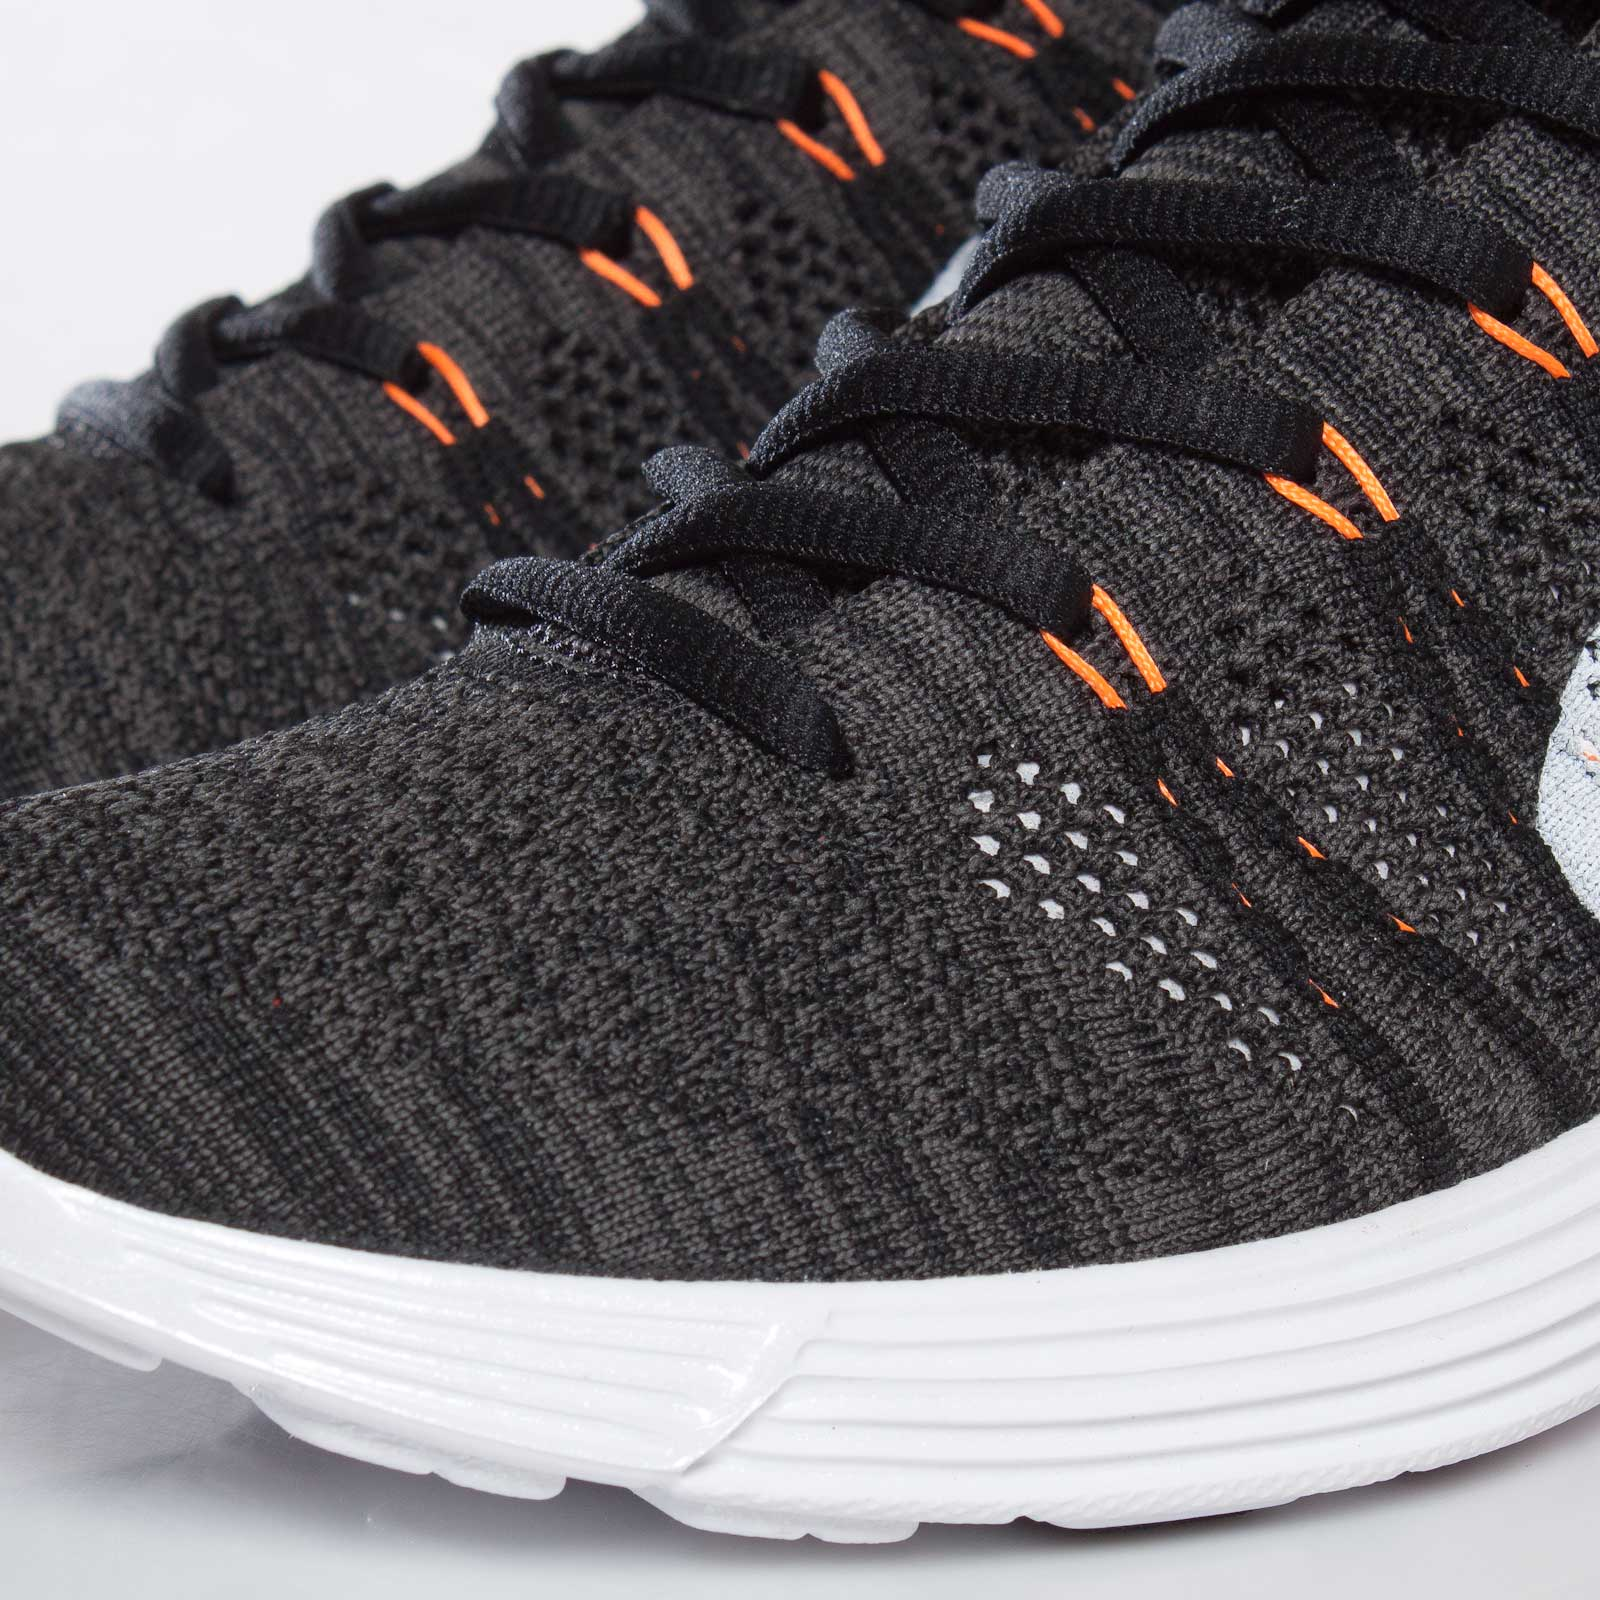 31b2c1feaf355e Nike Lunar Flyknit Chukka - 554969-081 - Sneakersnstuff